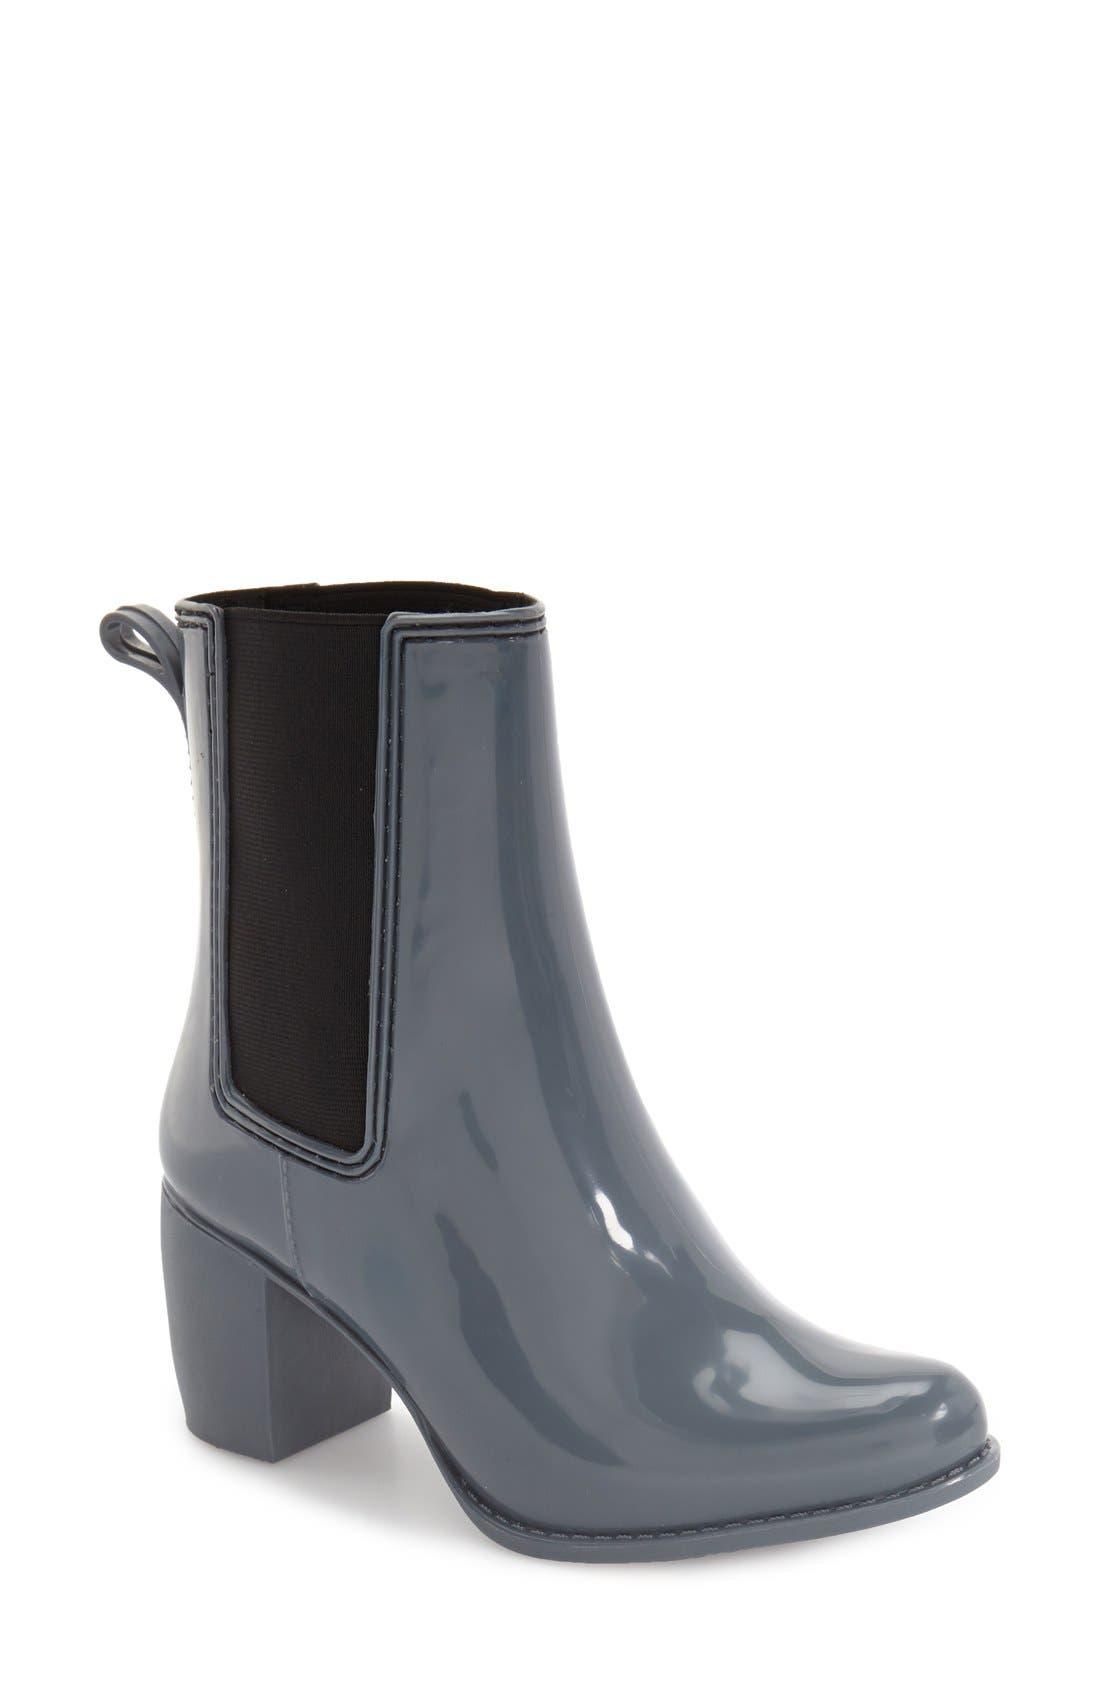 Alternate Image 1 Selected - Jeffrey Campbell 'Clima' Chelsea Rain Boot (Women)